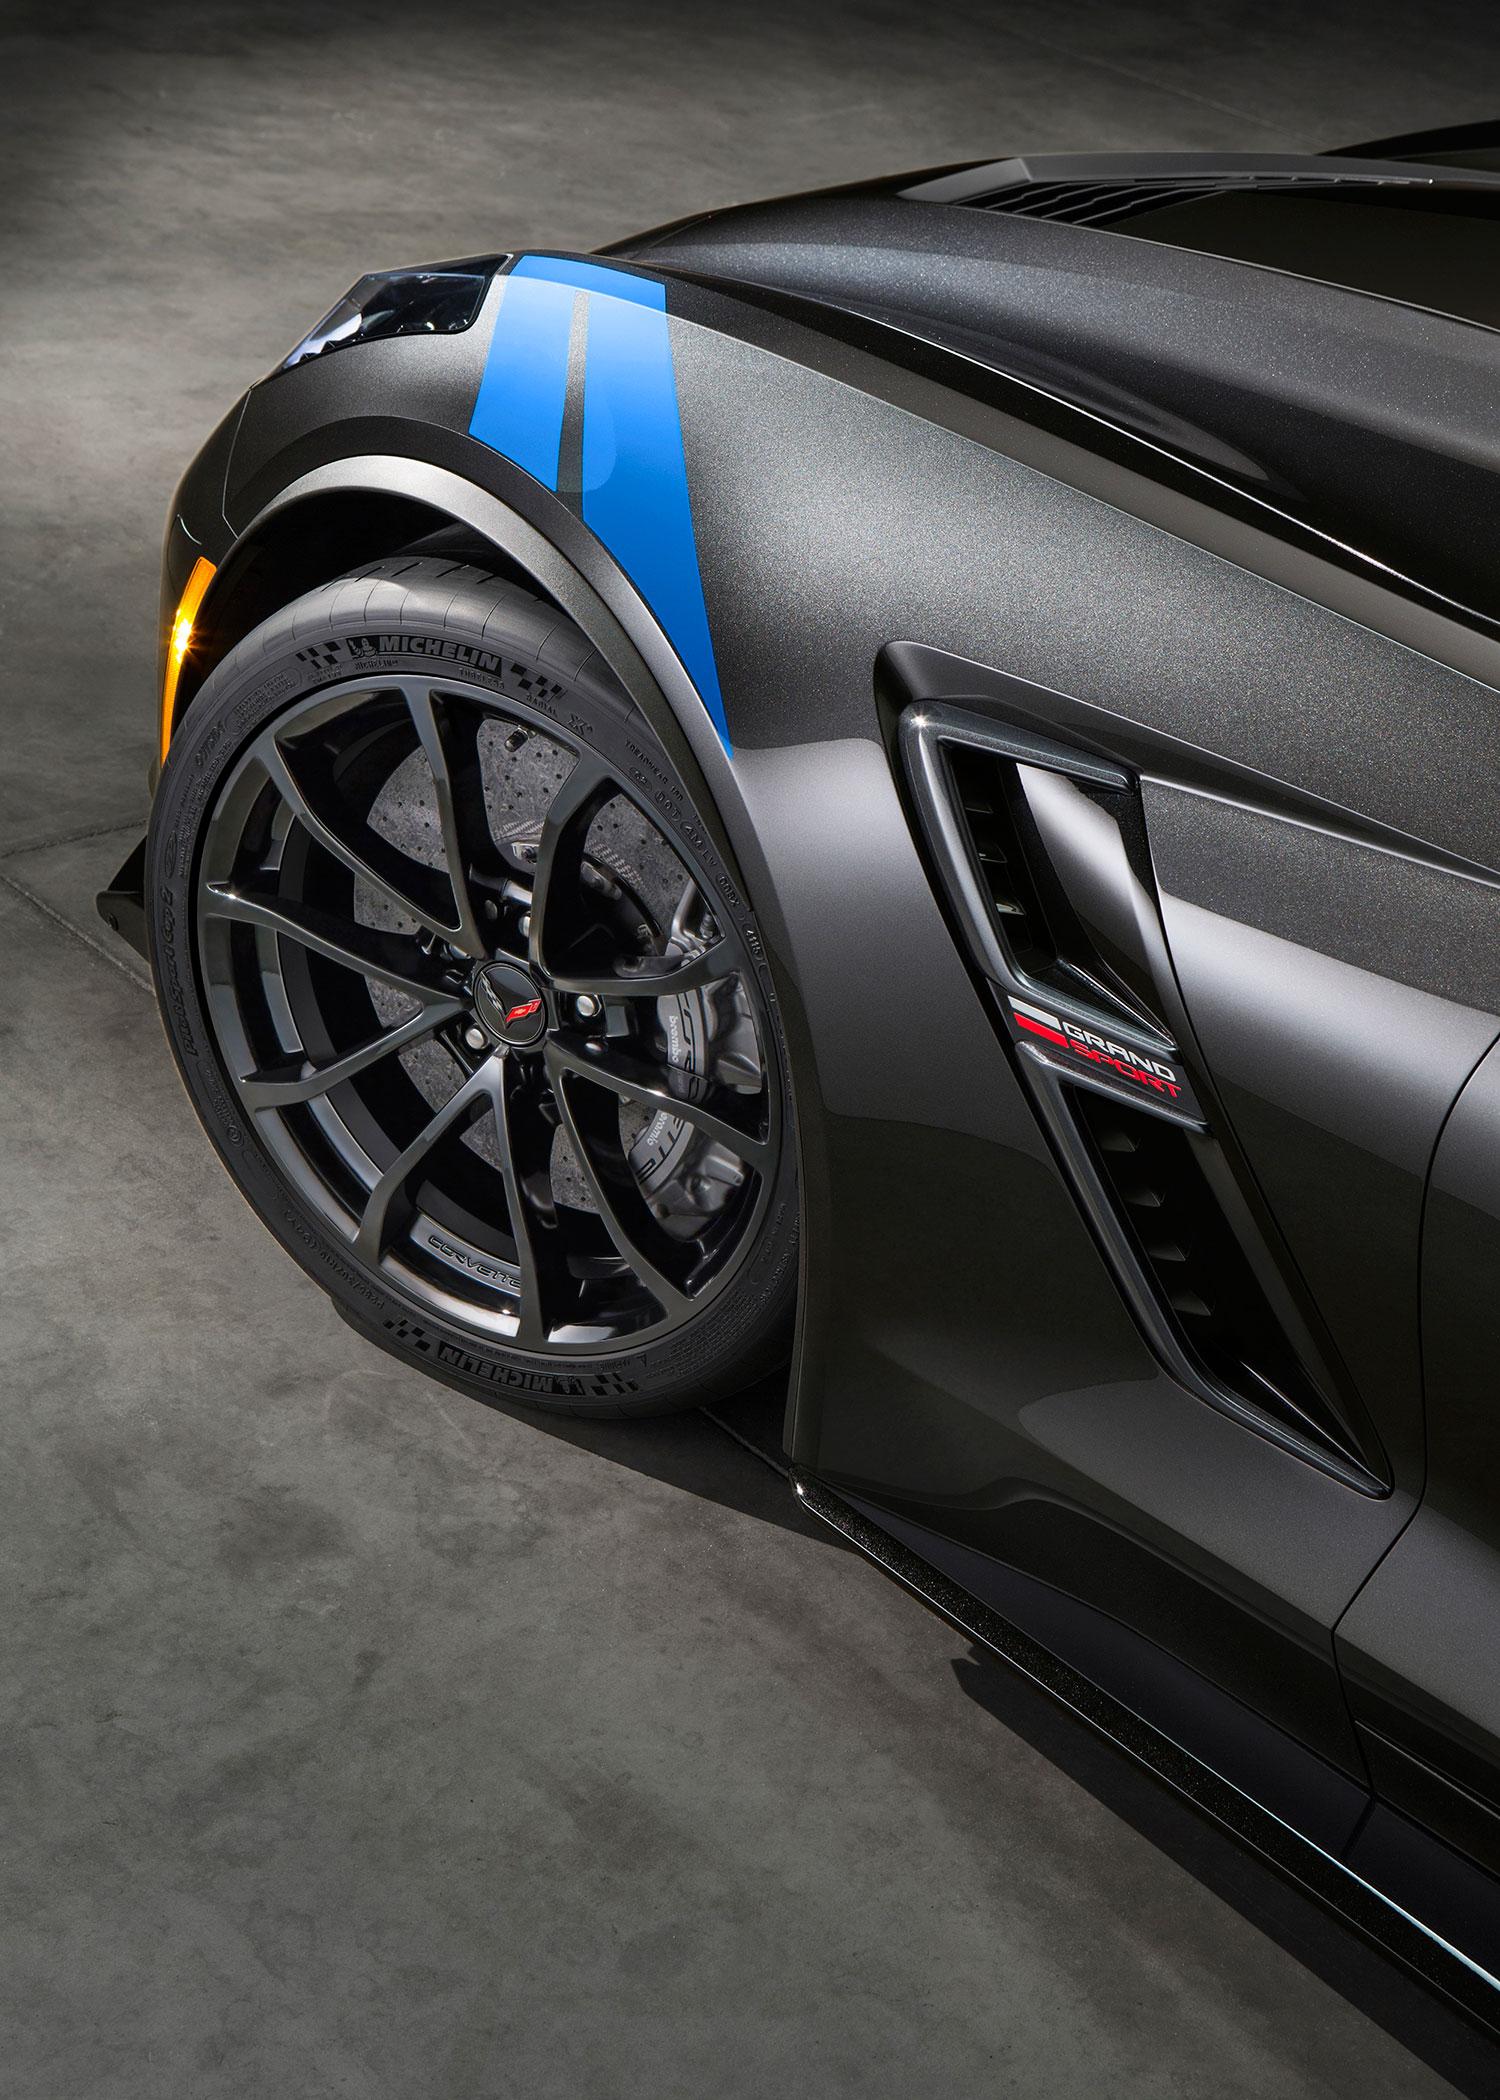 2017 Chevrolet Corvette Grand Sport Bridges C7 Stingray and Z06 ...